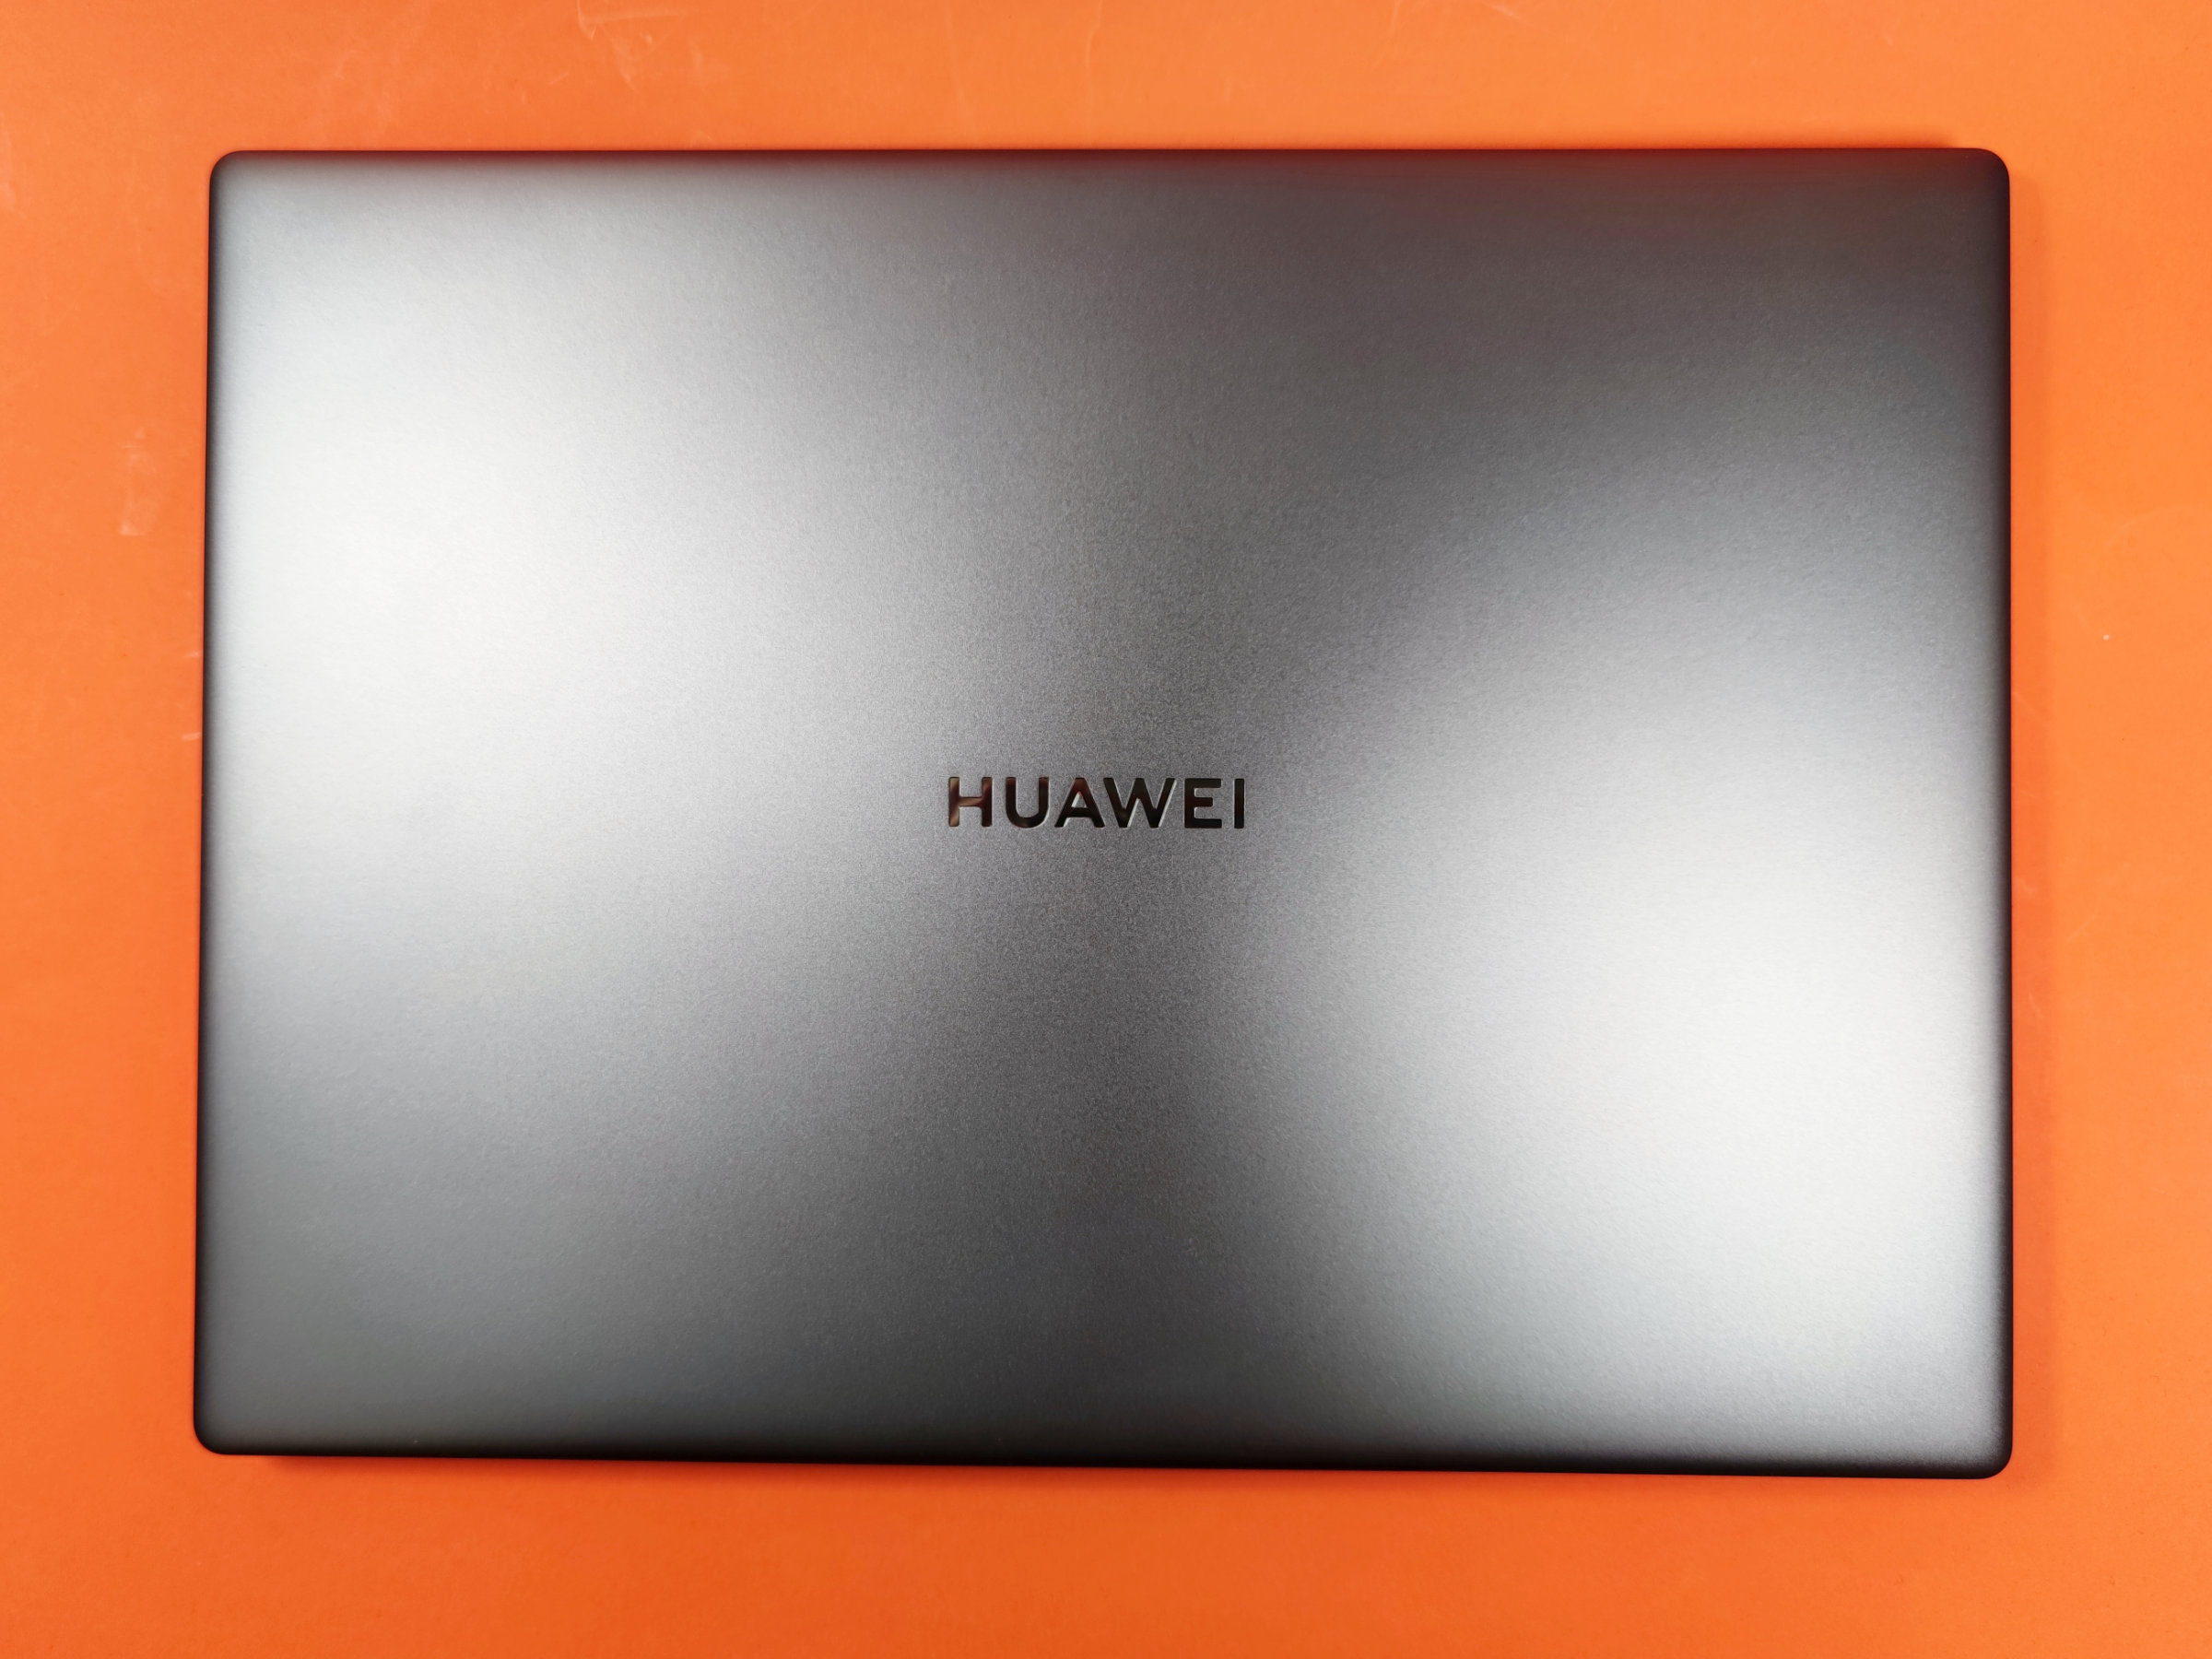 Deckel des Huawei Matebook 14